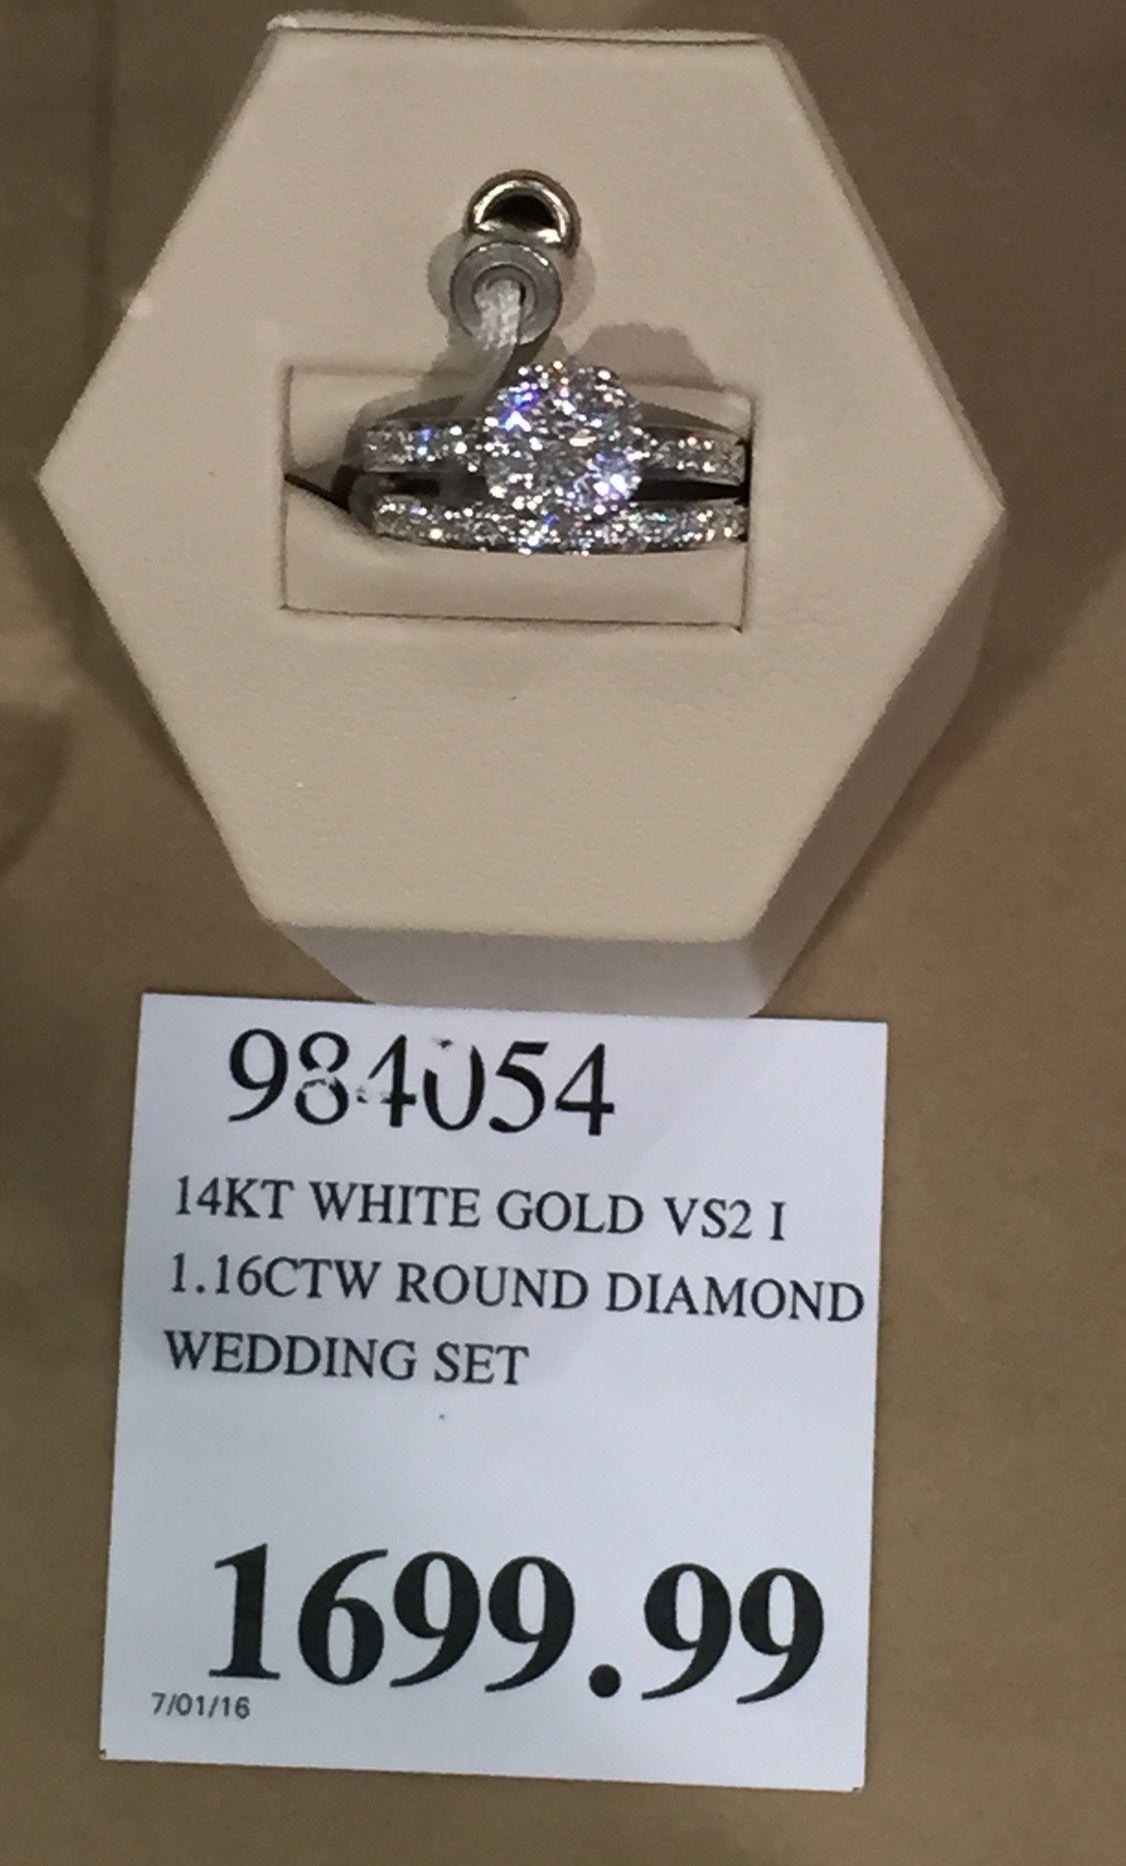 costco wedding ring set my favorite so gorgeous - Costco Wedding Rings